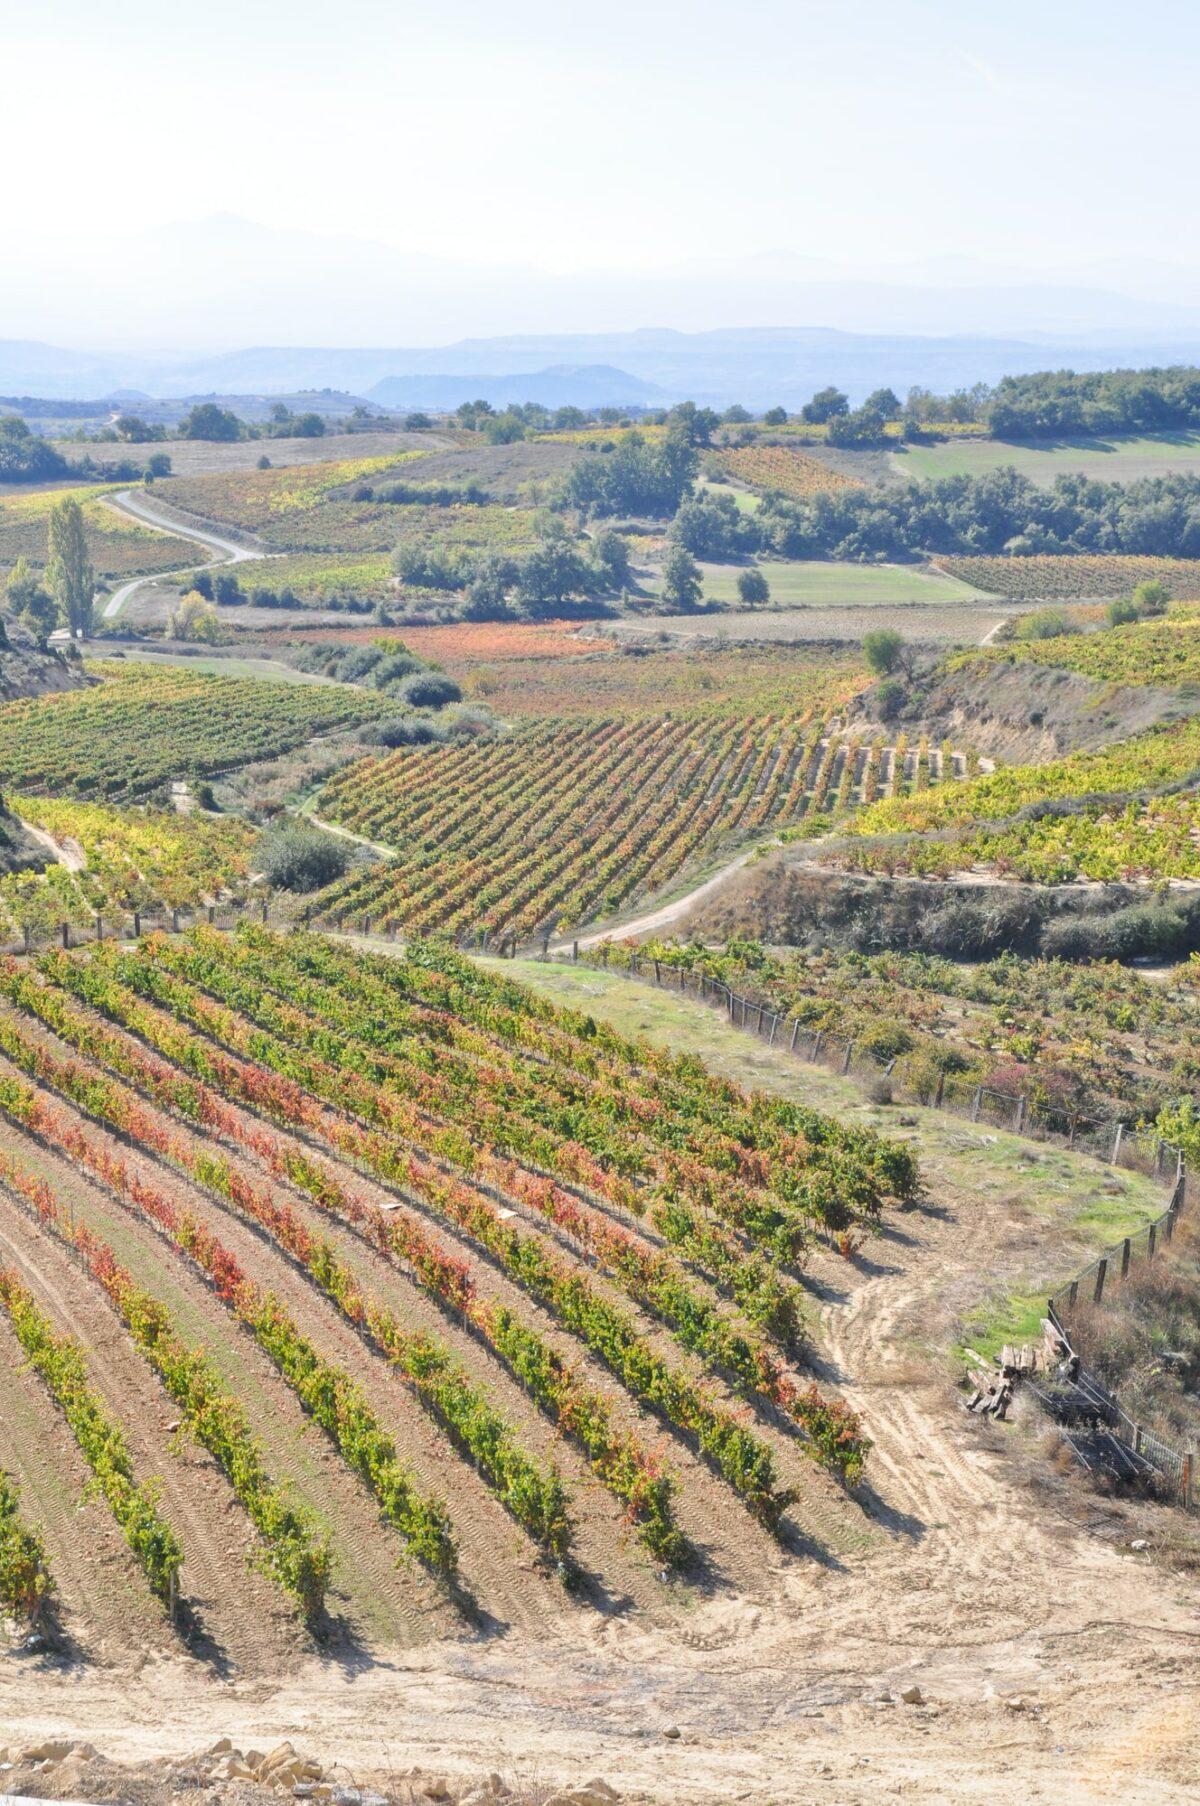 Vineyard landscape of Rioja Wine Region, Spain